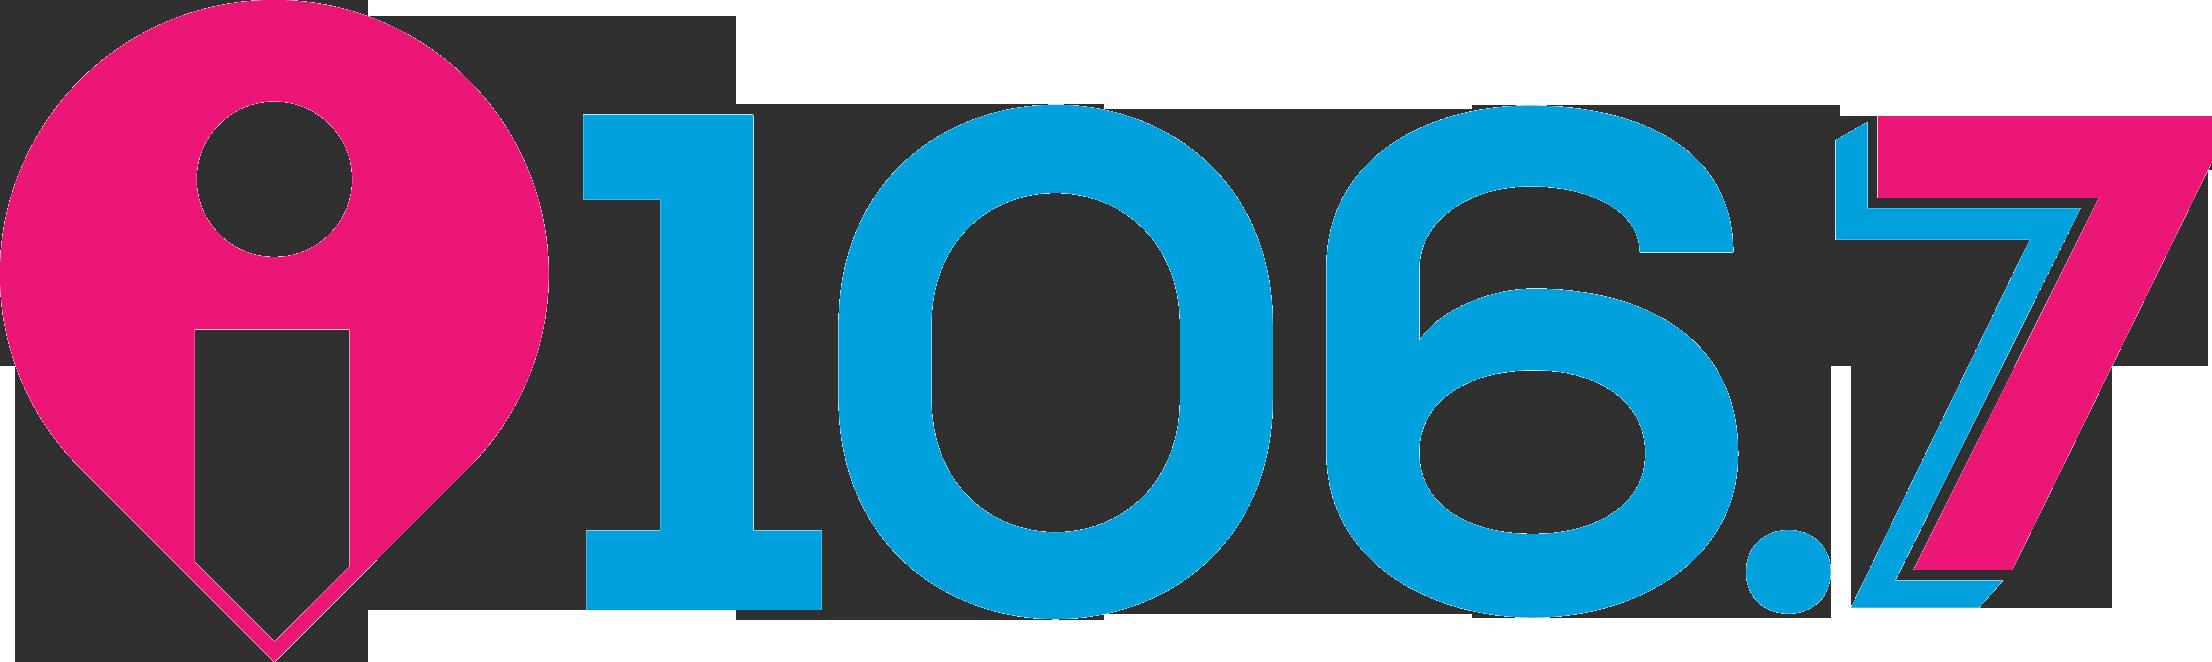 i106.7 Hits